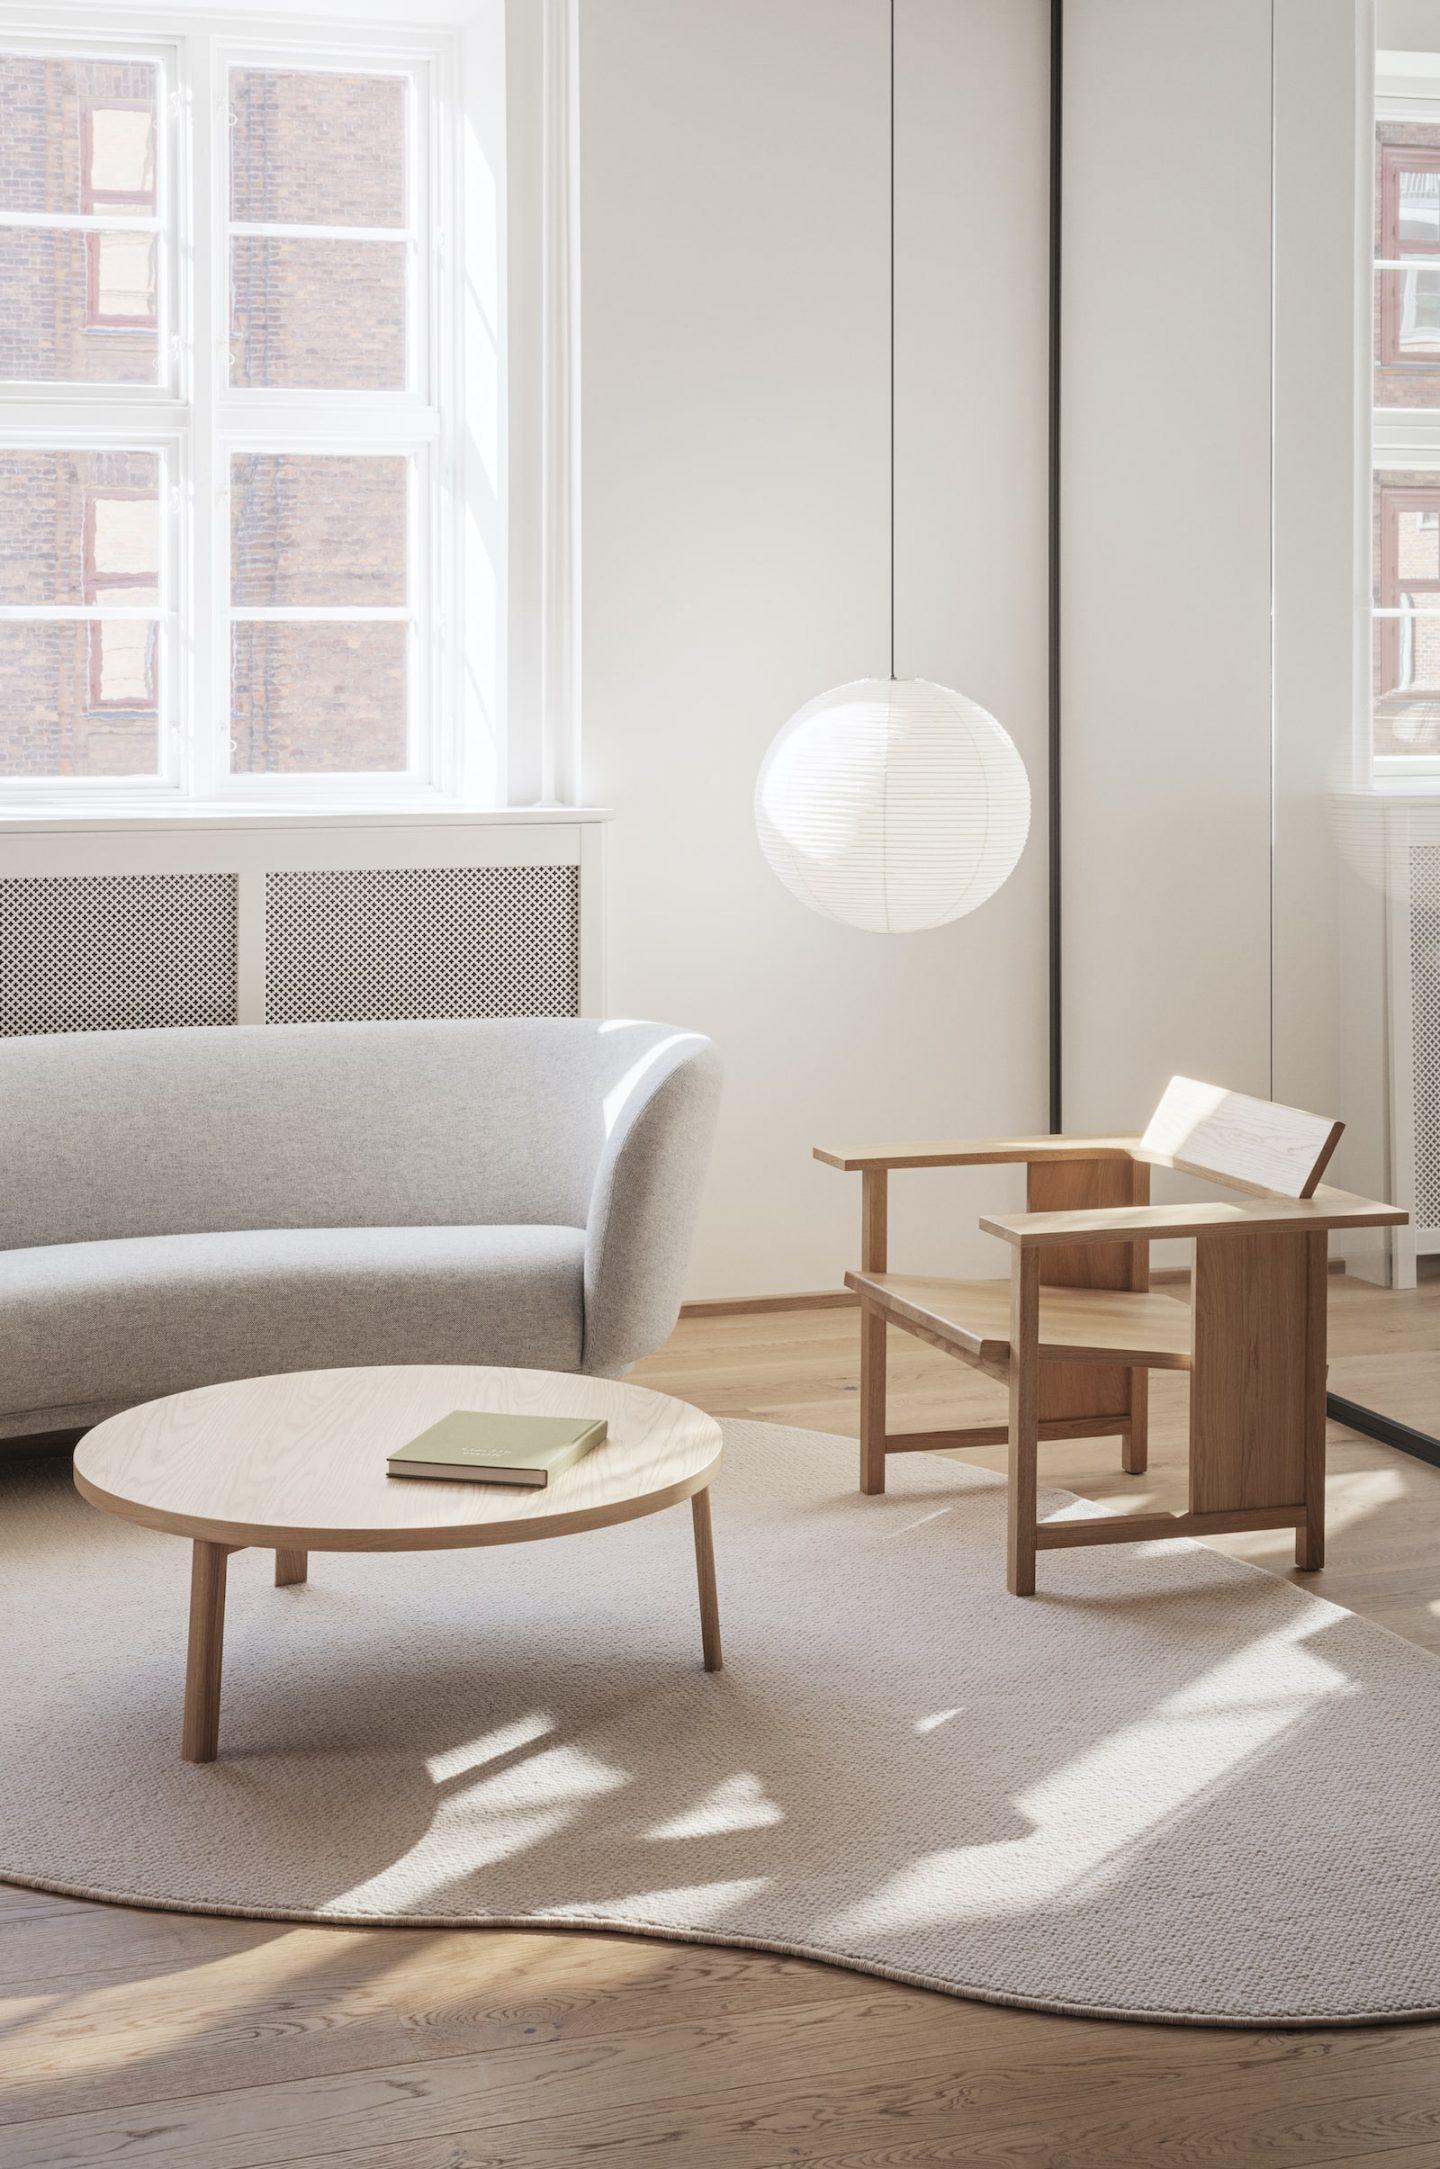 IGNANT-Design-Aspekt-Office-020